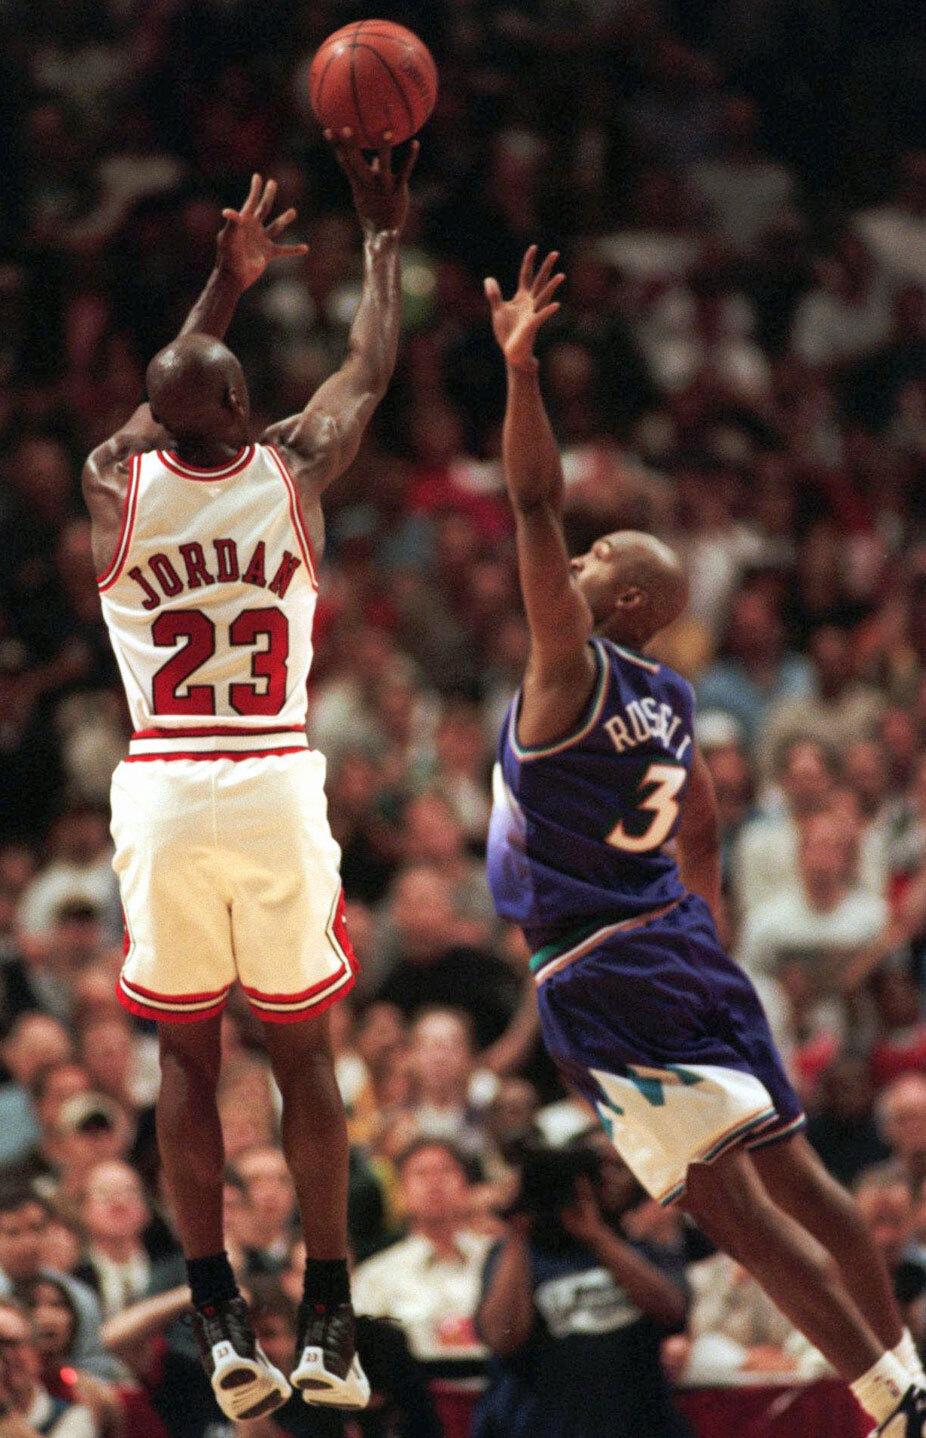 Michael Jordan Impersonator Booed At Game : NPR